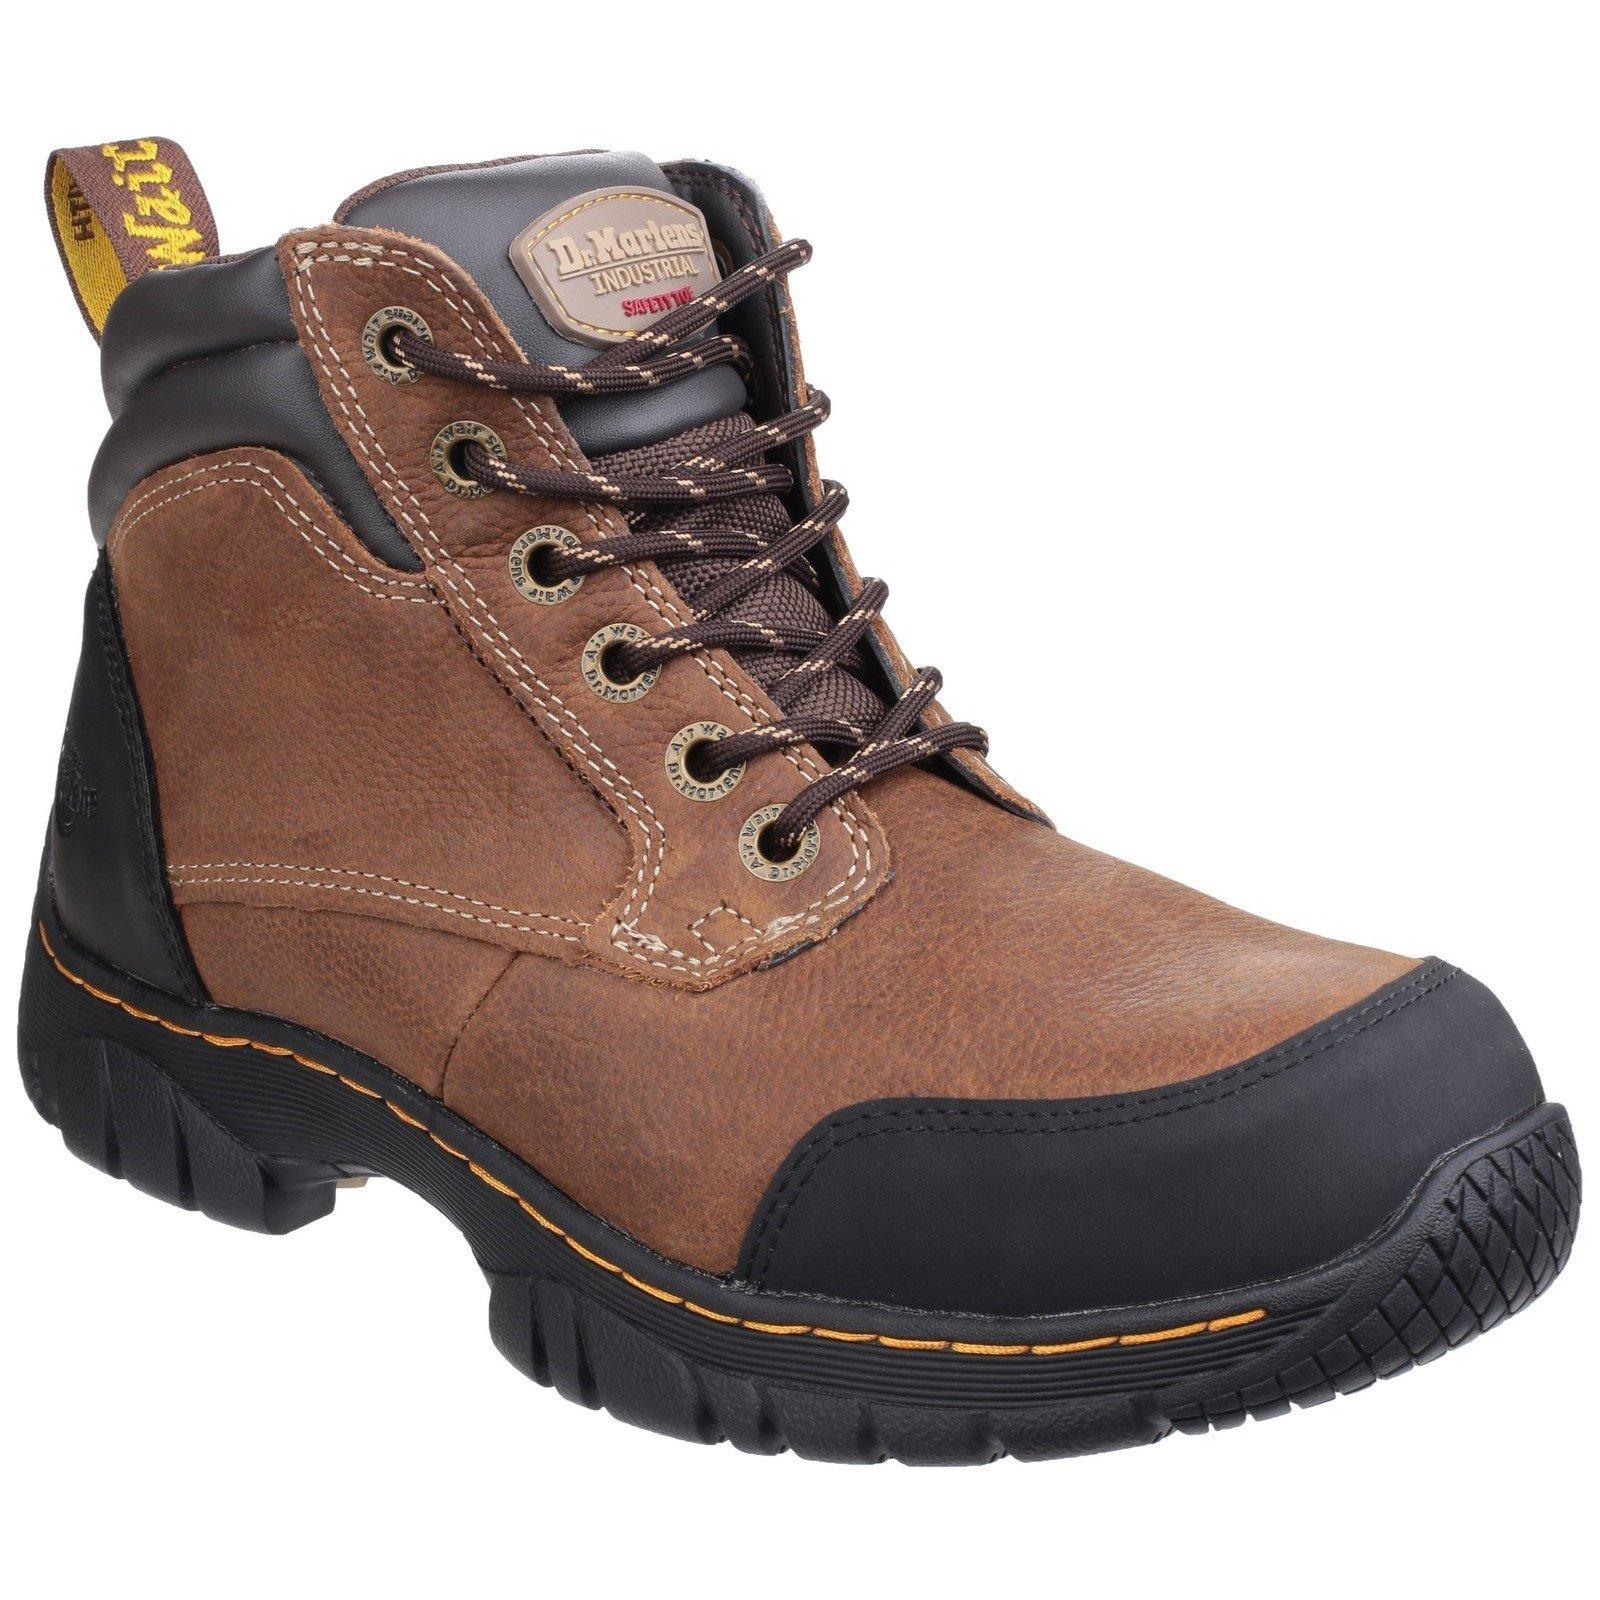 Dr Martens Unisex Riverton SB Lace up Hiker Safety Boot 24534 - Brown 9